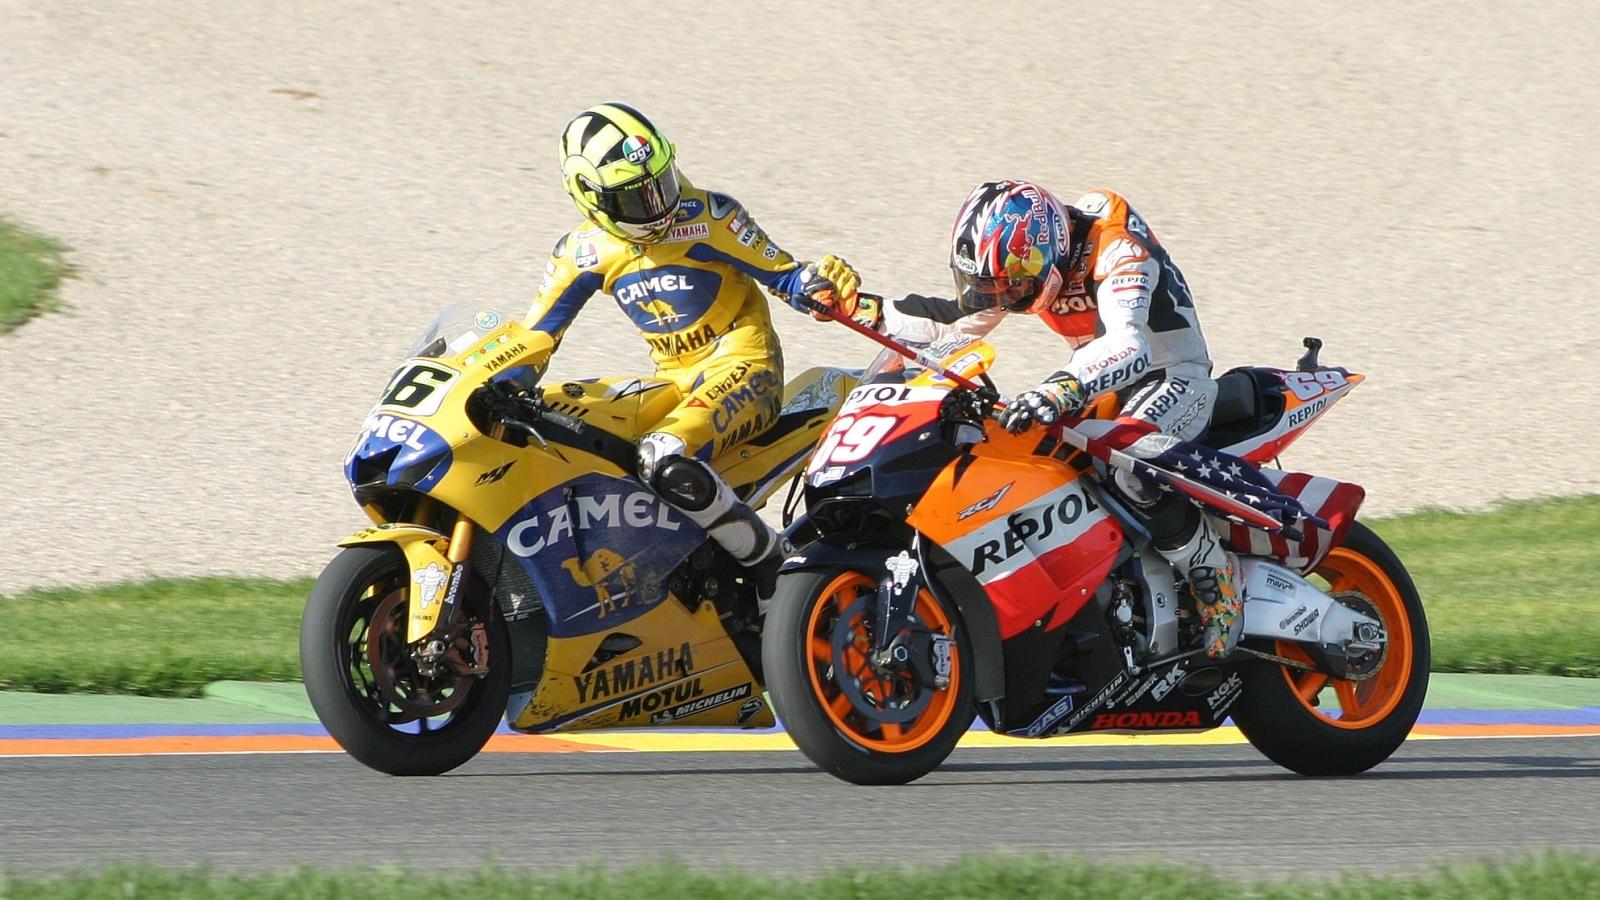 25 años Valentino Rossi: 2006 – Subcampeón MotoGP – Yamaha YZR-M1 / Camel Yamaha Team